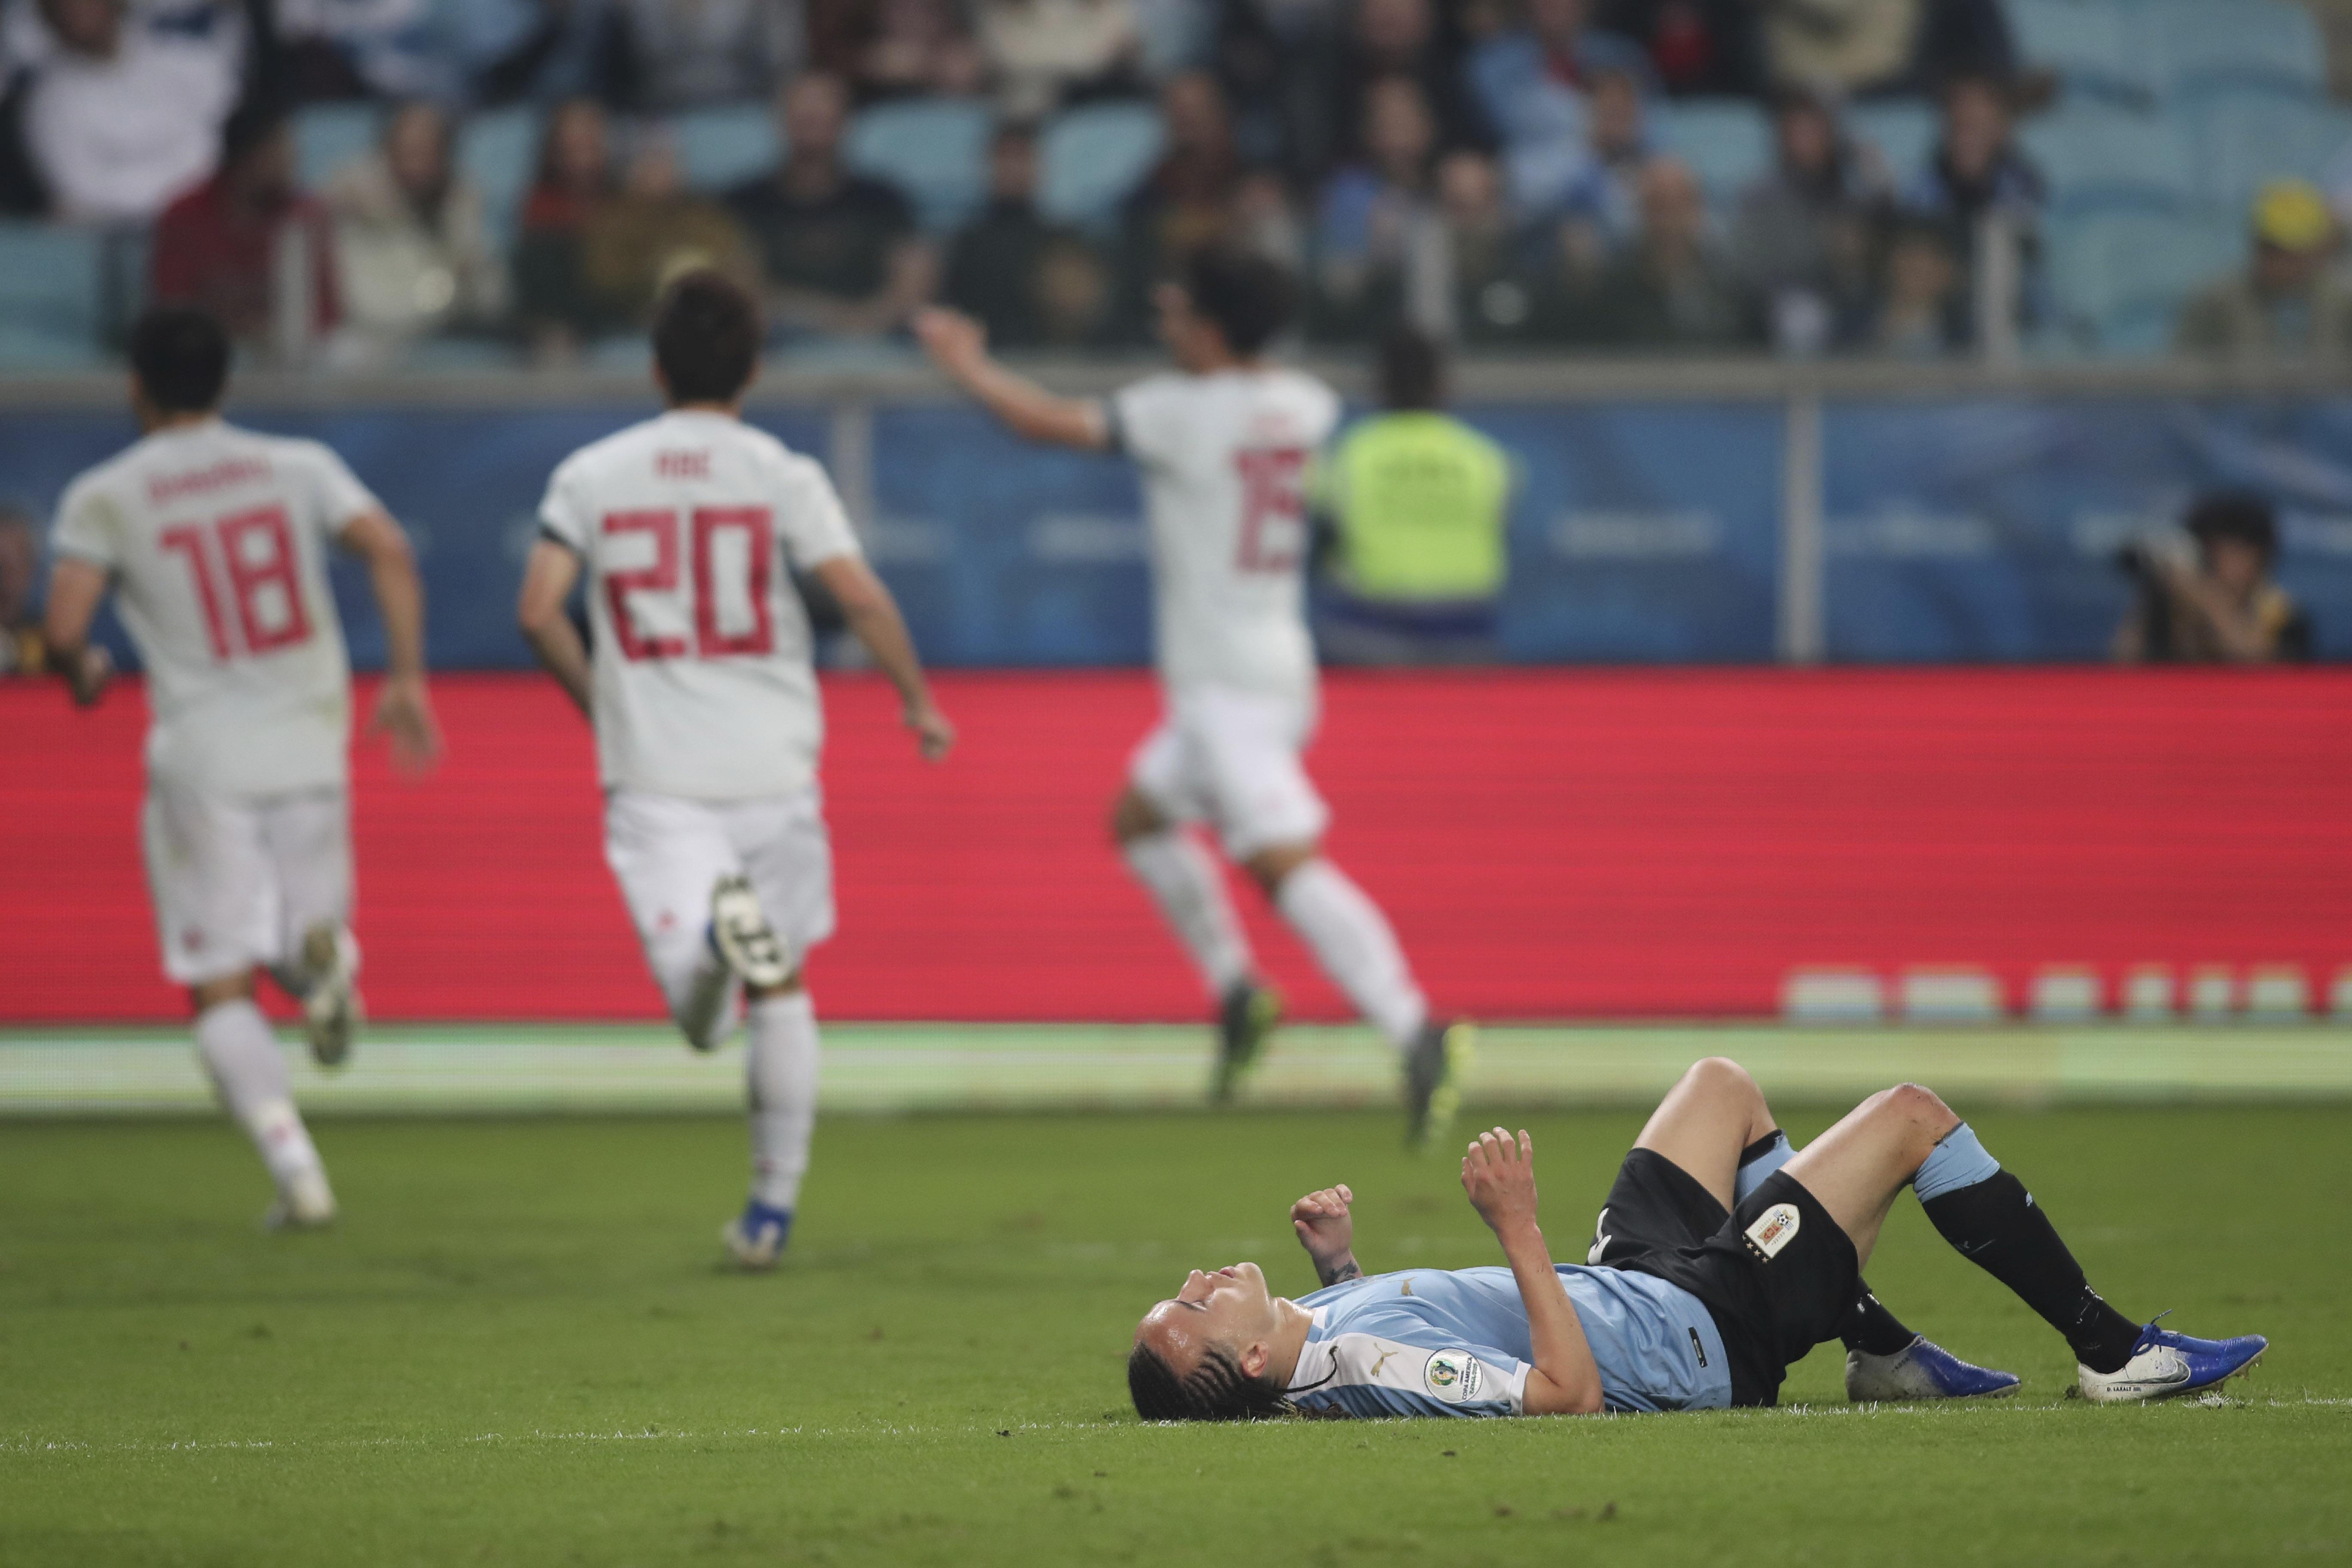 Copa America: Uruguay midfielder Laxalt has hamstring injury